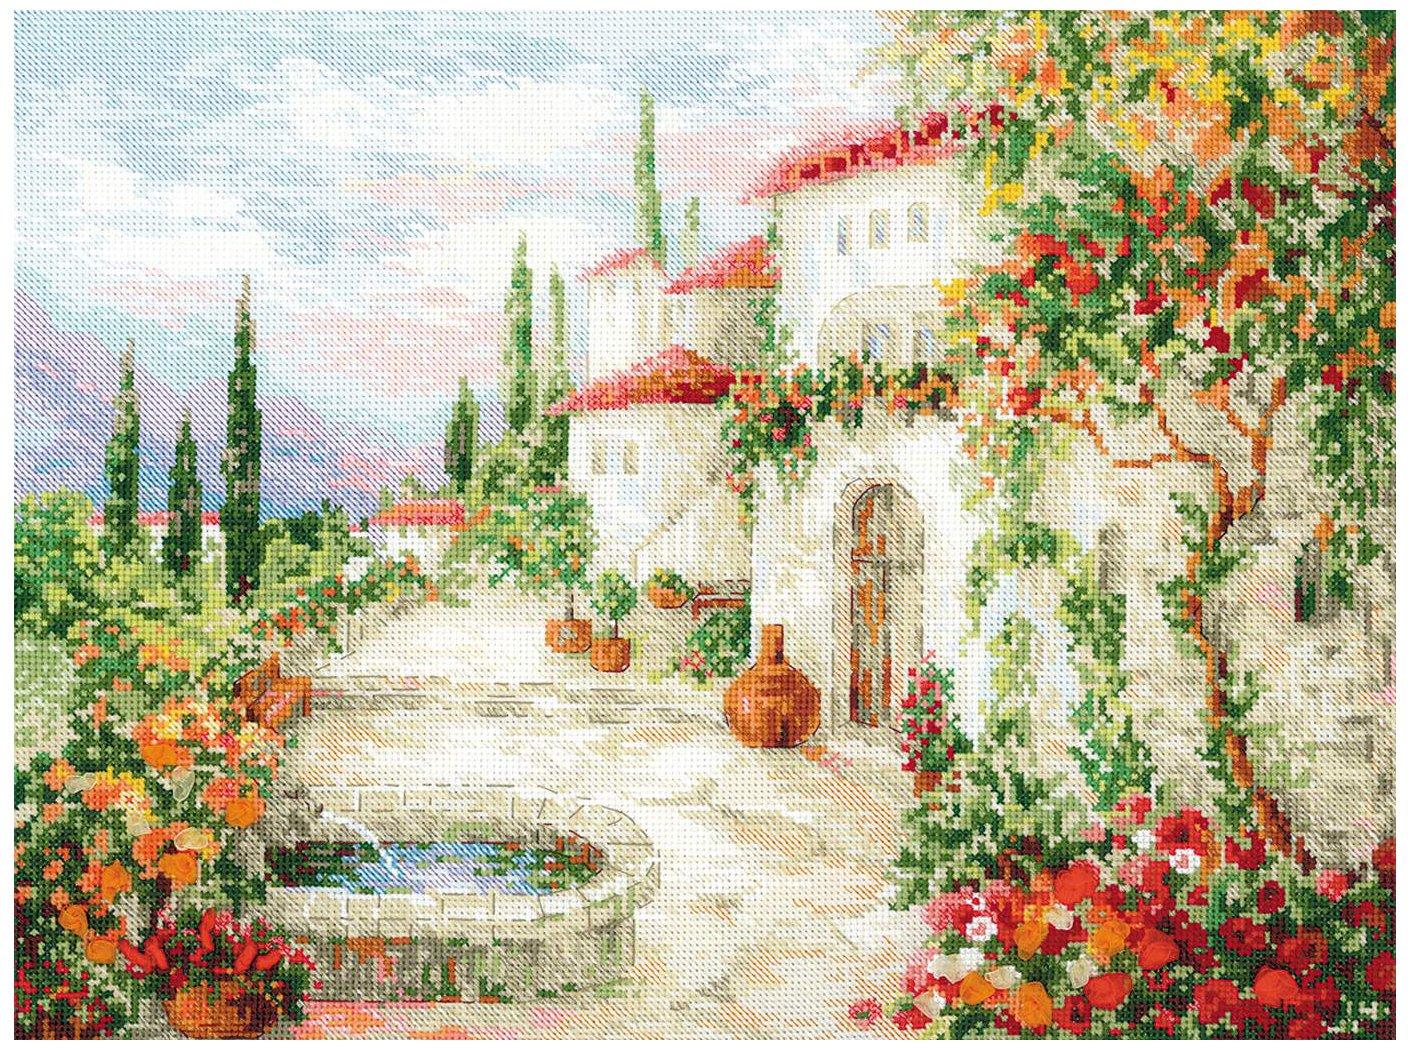 Riolis Kreuzstich-Set Im Urlaub Mehrfarbig 30 x 40 x 0.1 cm Baumwolle